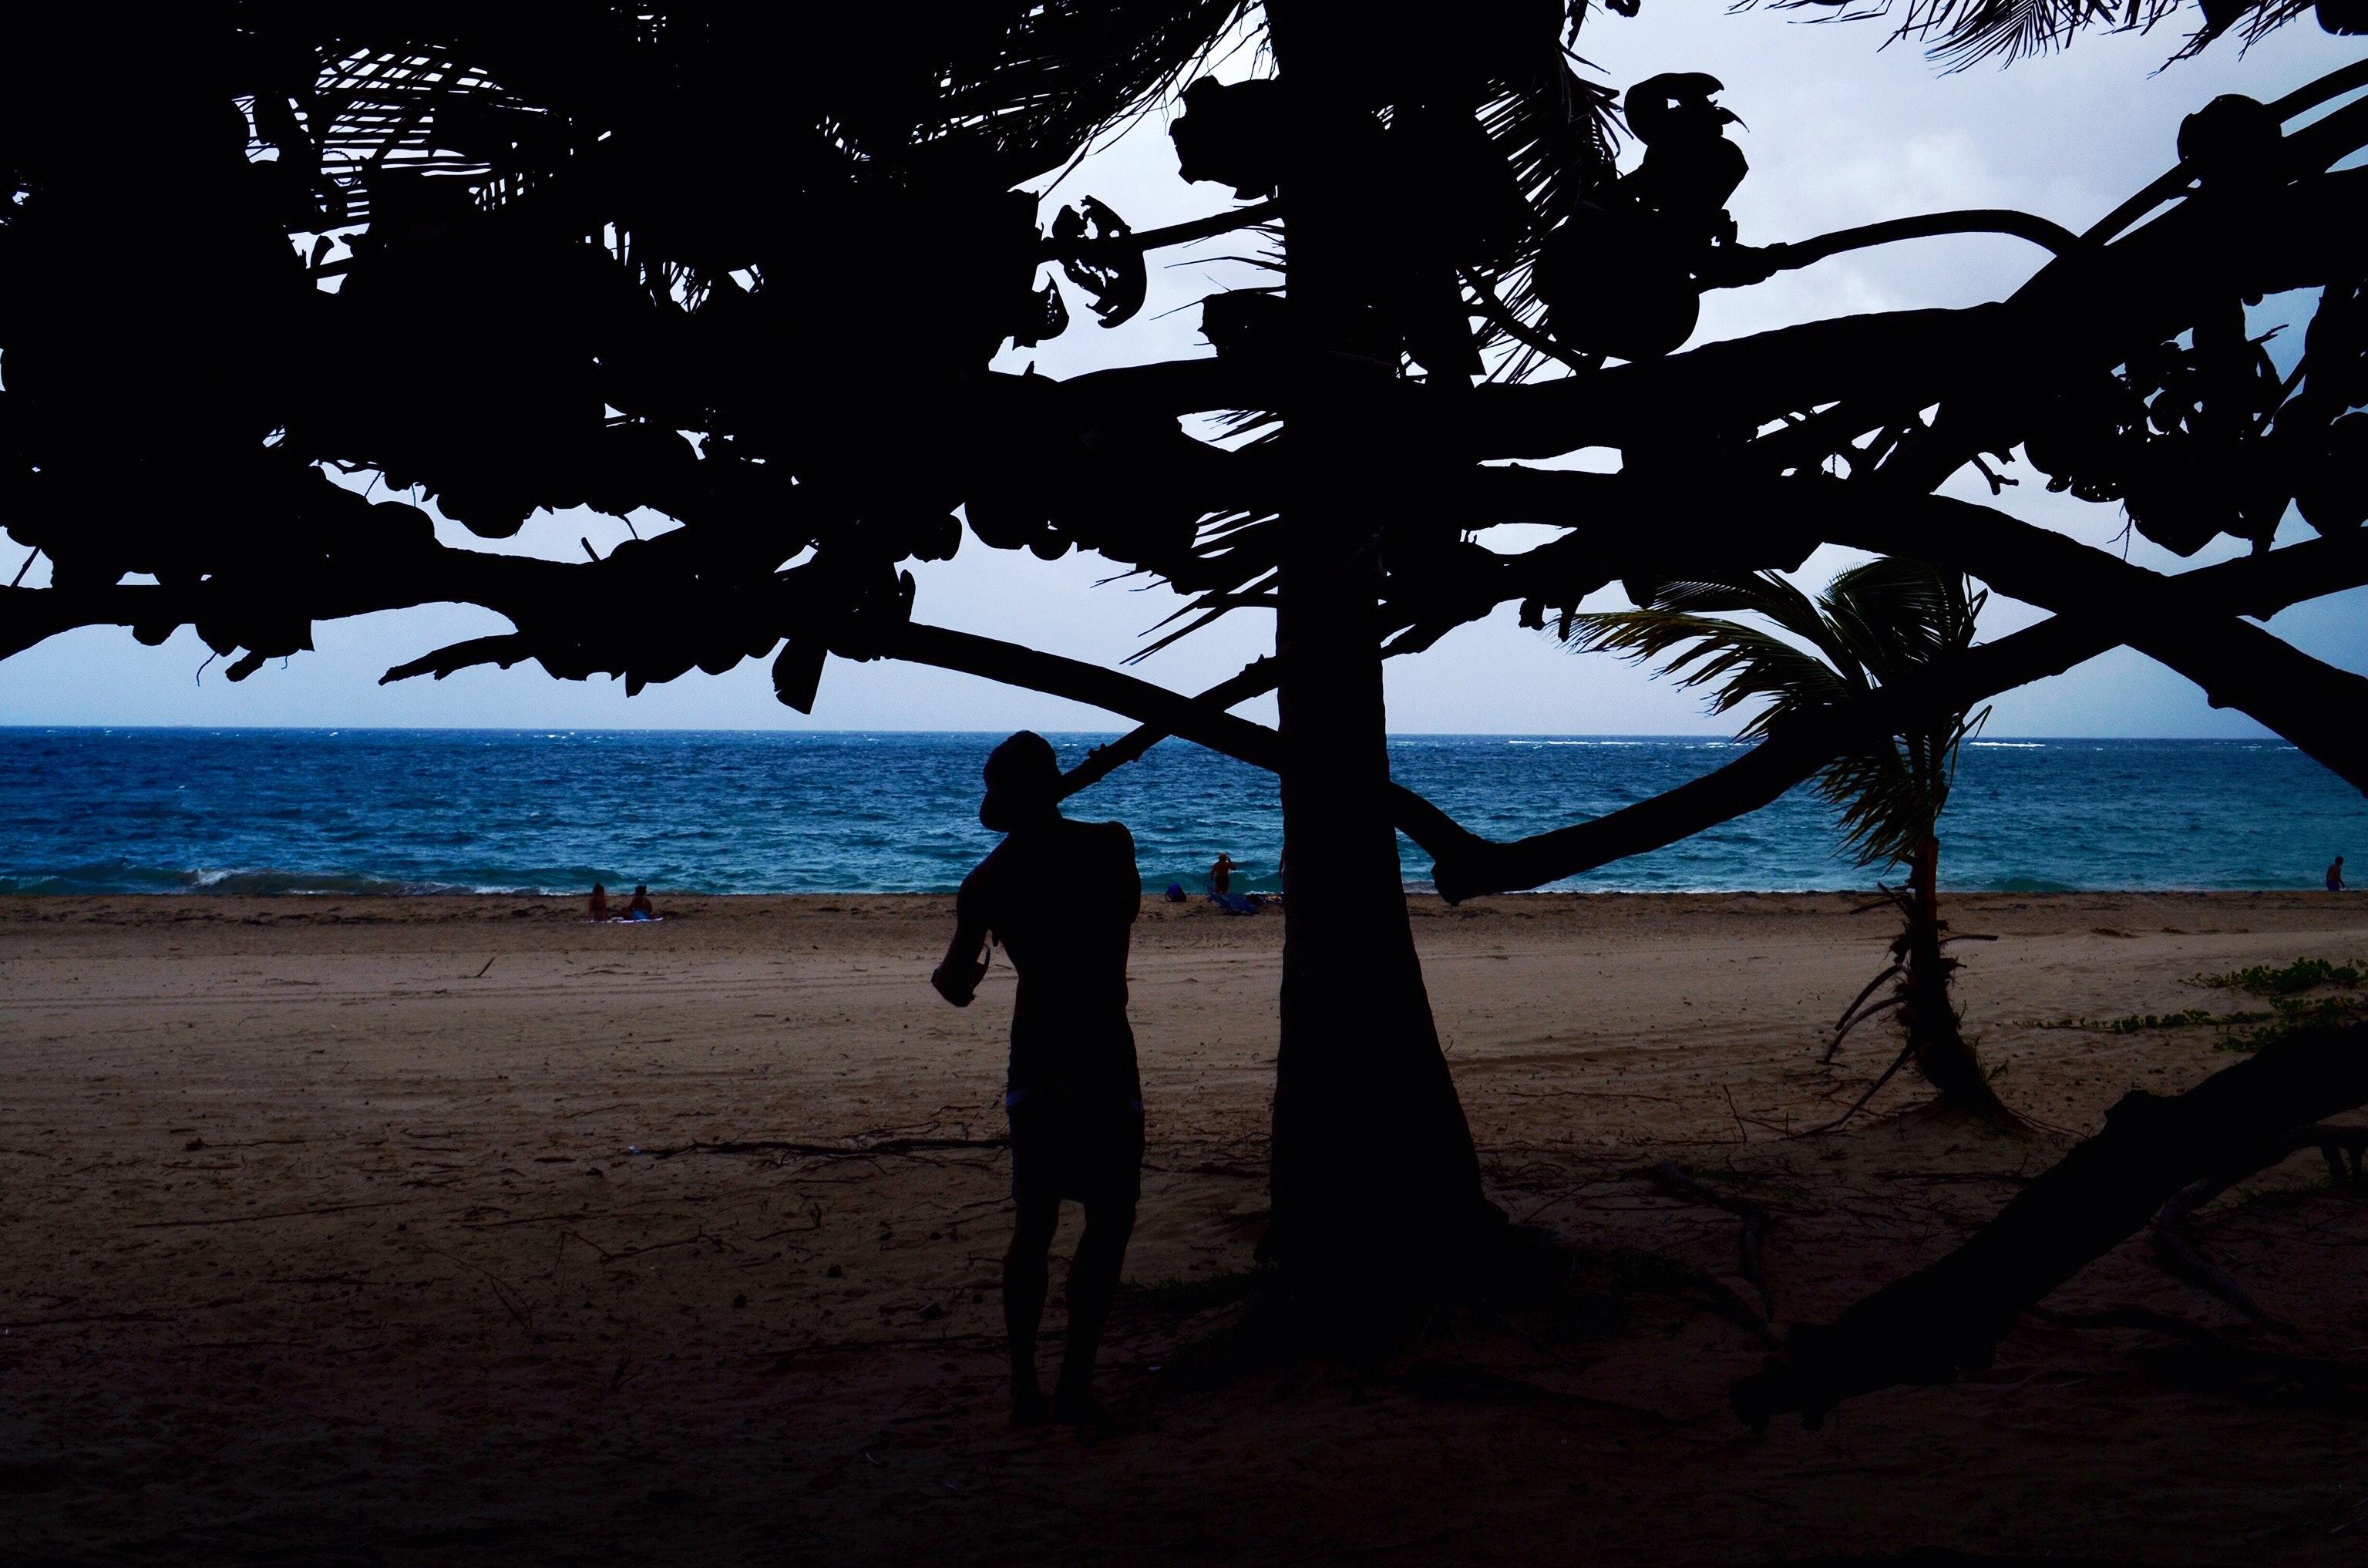 Silhouette of man beside tree near seashore photo